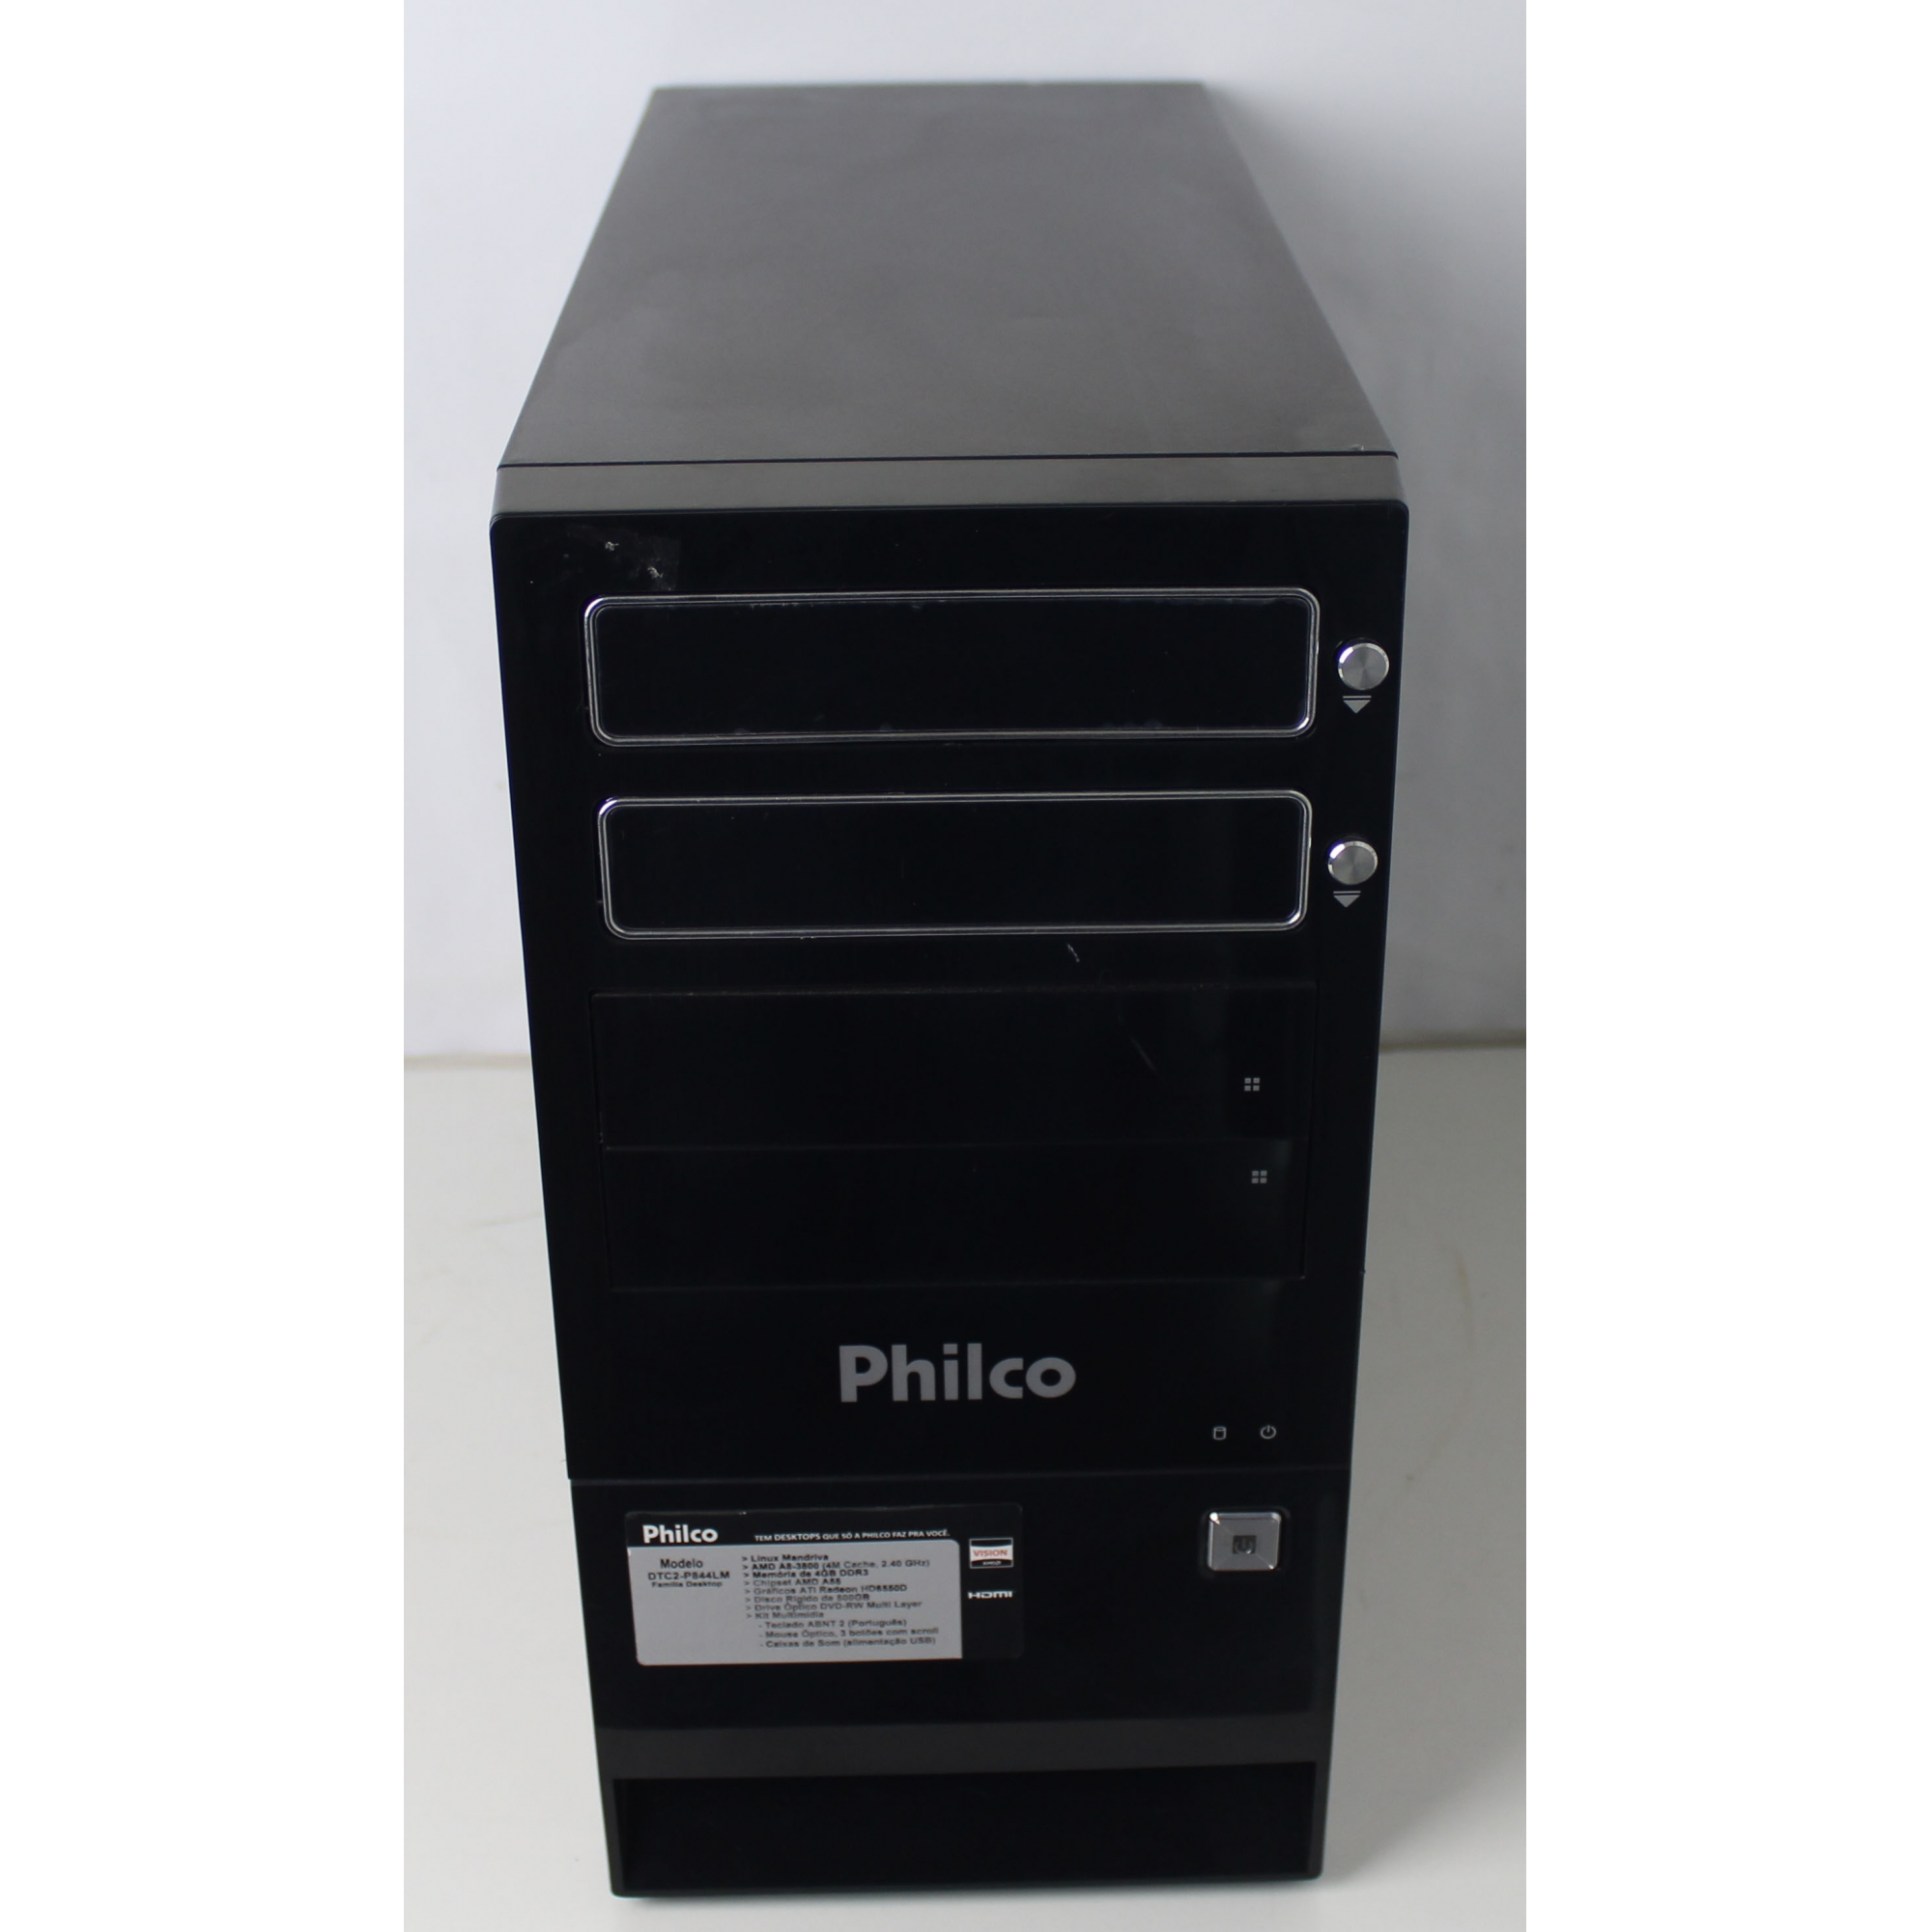 CPU PHILCO P844LM AMD A8 2.4GHZ 4GB HD-500GB